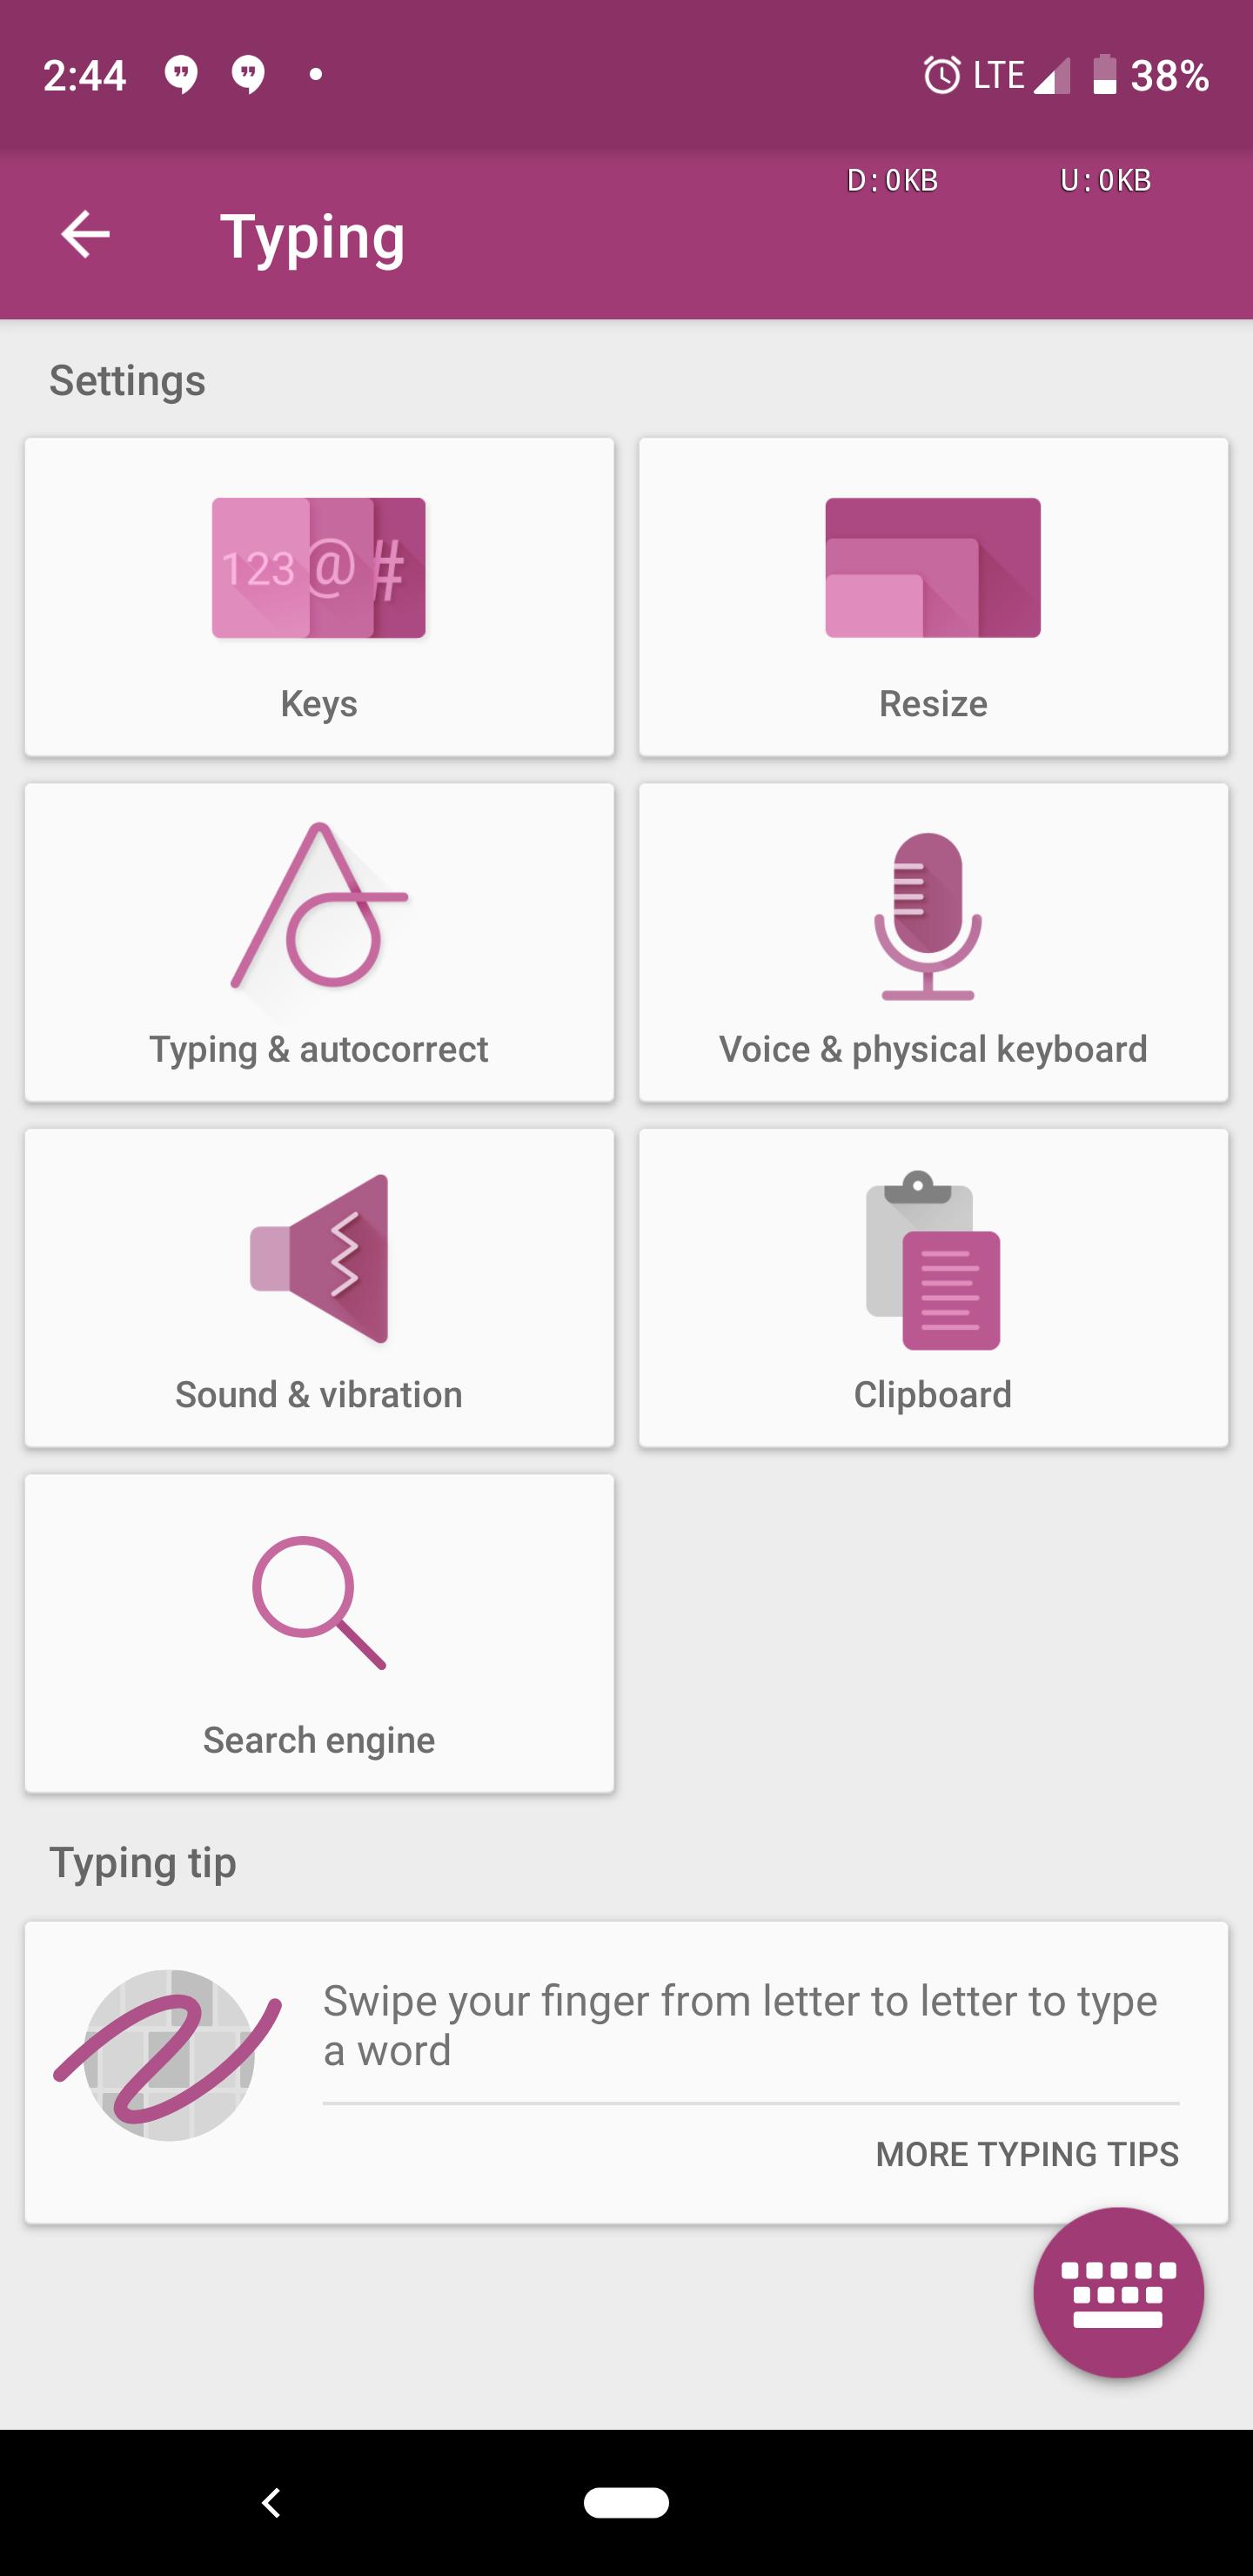 Microsoft's SwiftKey adds Google as search engine option